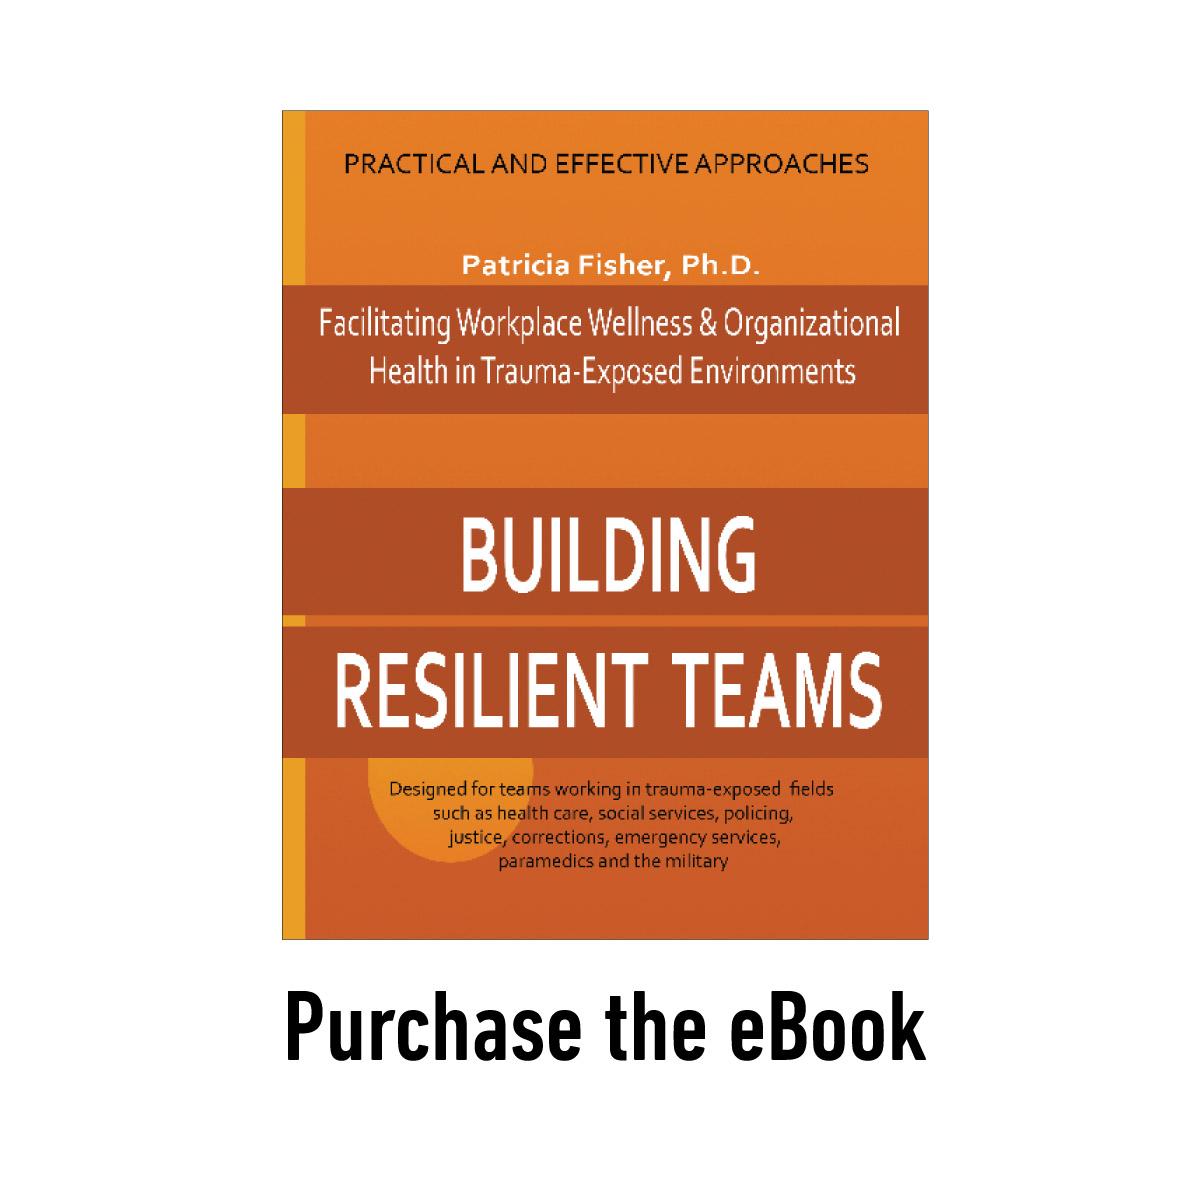 Building Resilient Teams - eBook